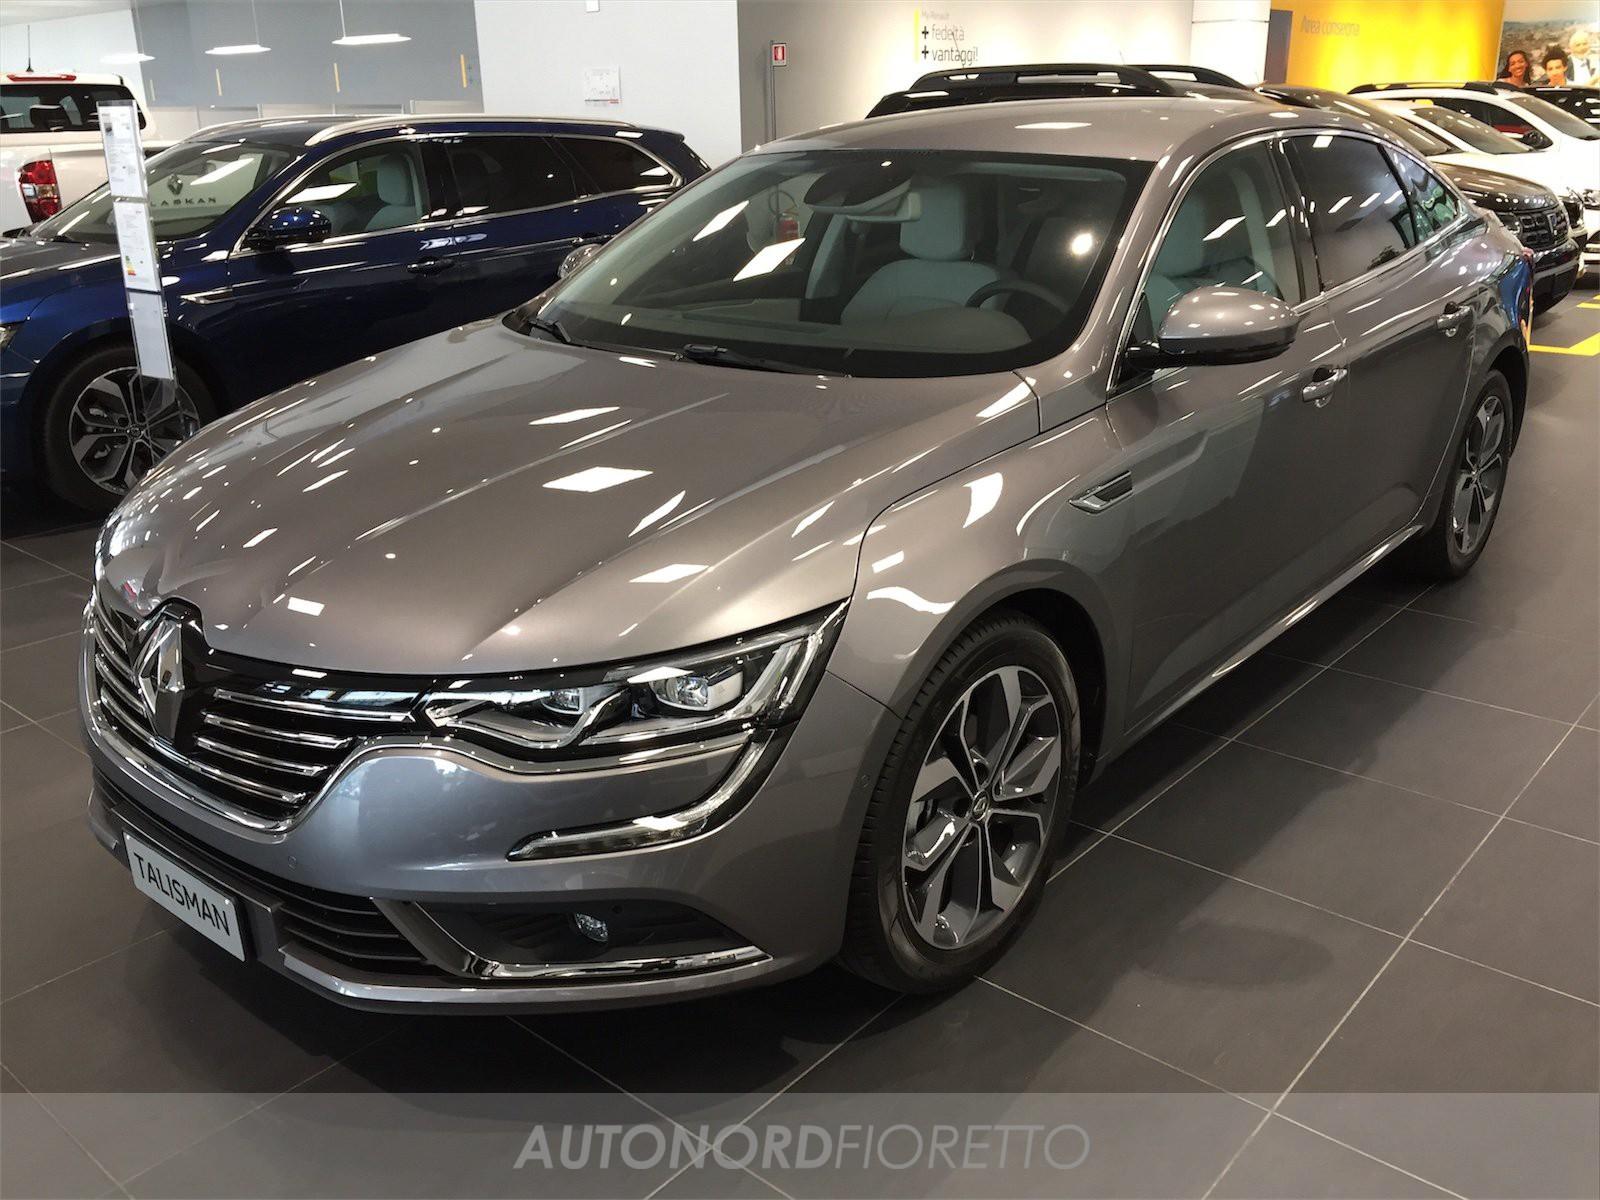 AUTONORD Renault Talisman